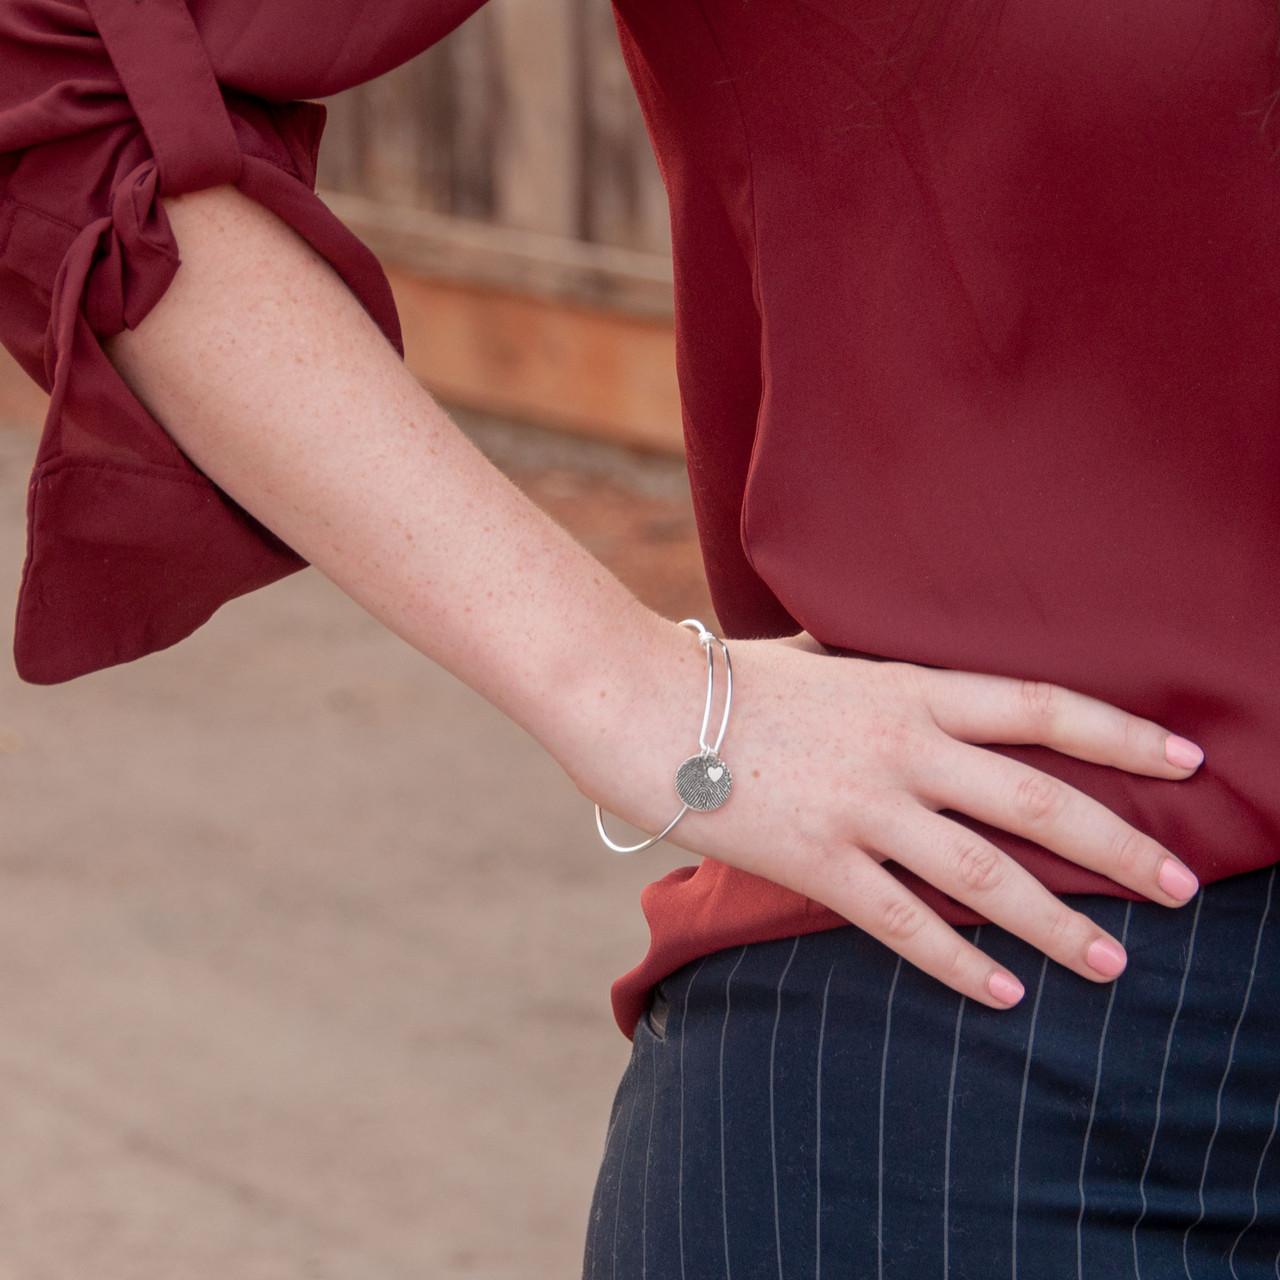 Adjustable sterling silver bracelet with custom fingerprint charm, shown on a model